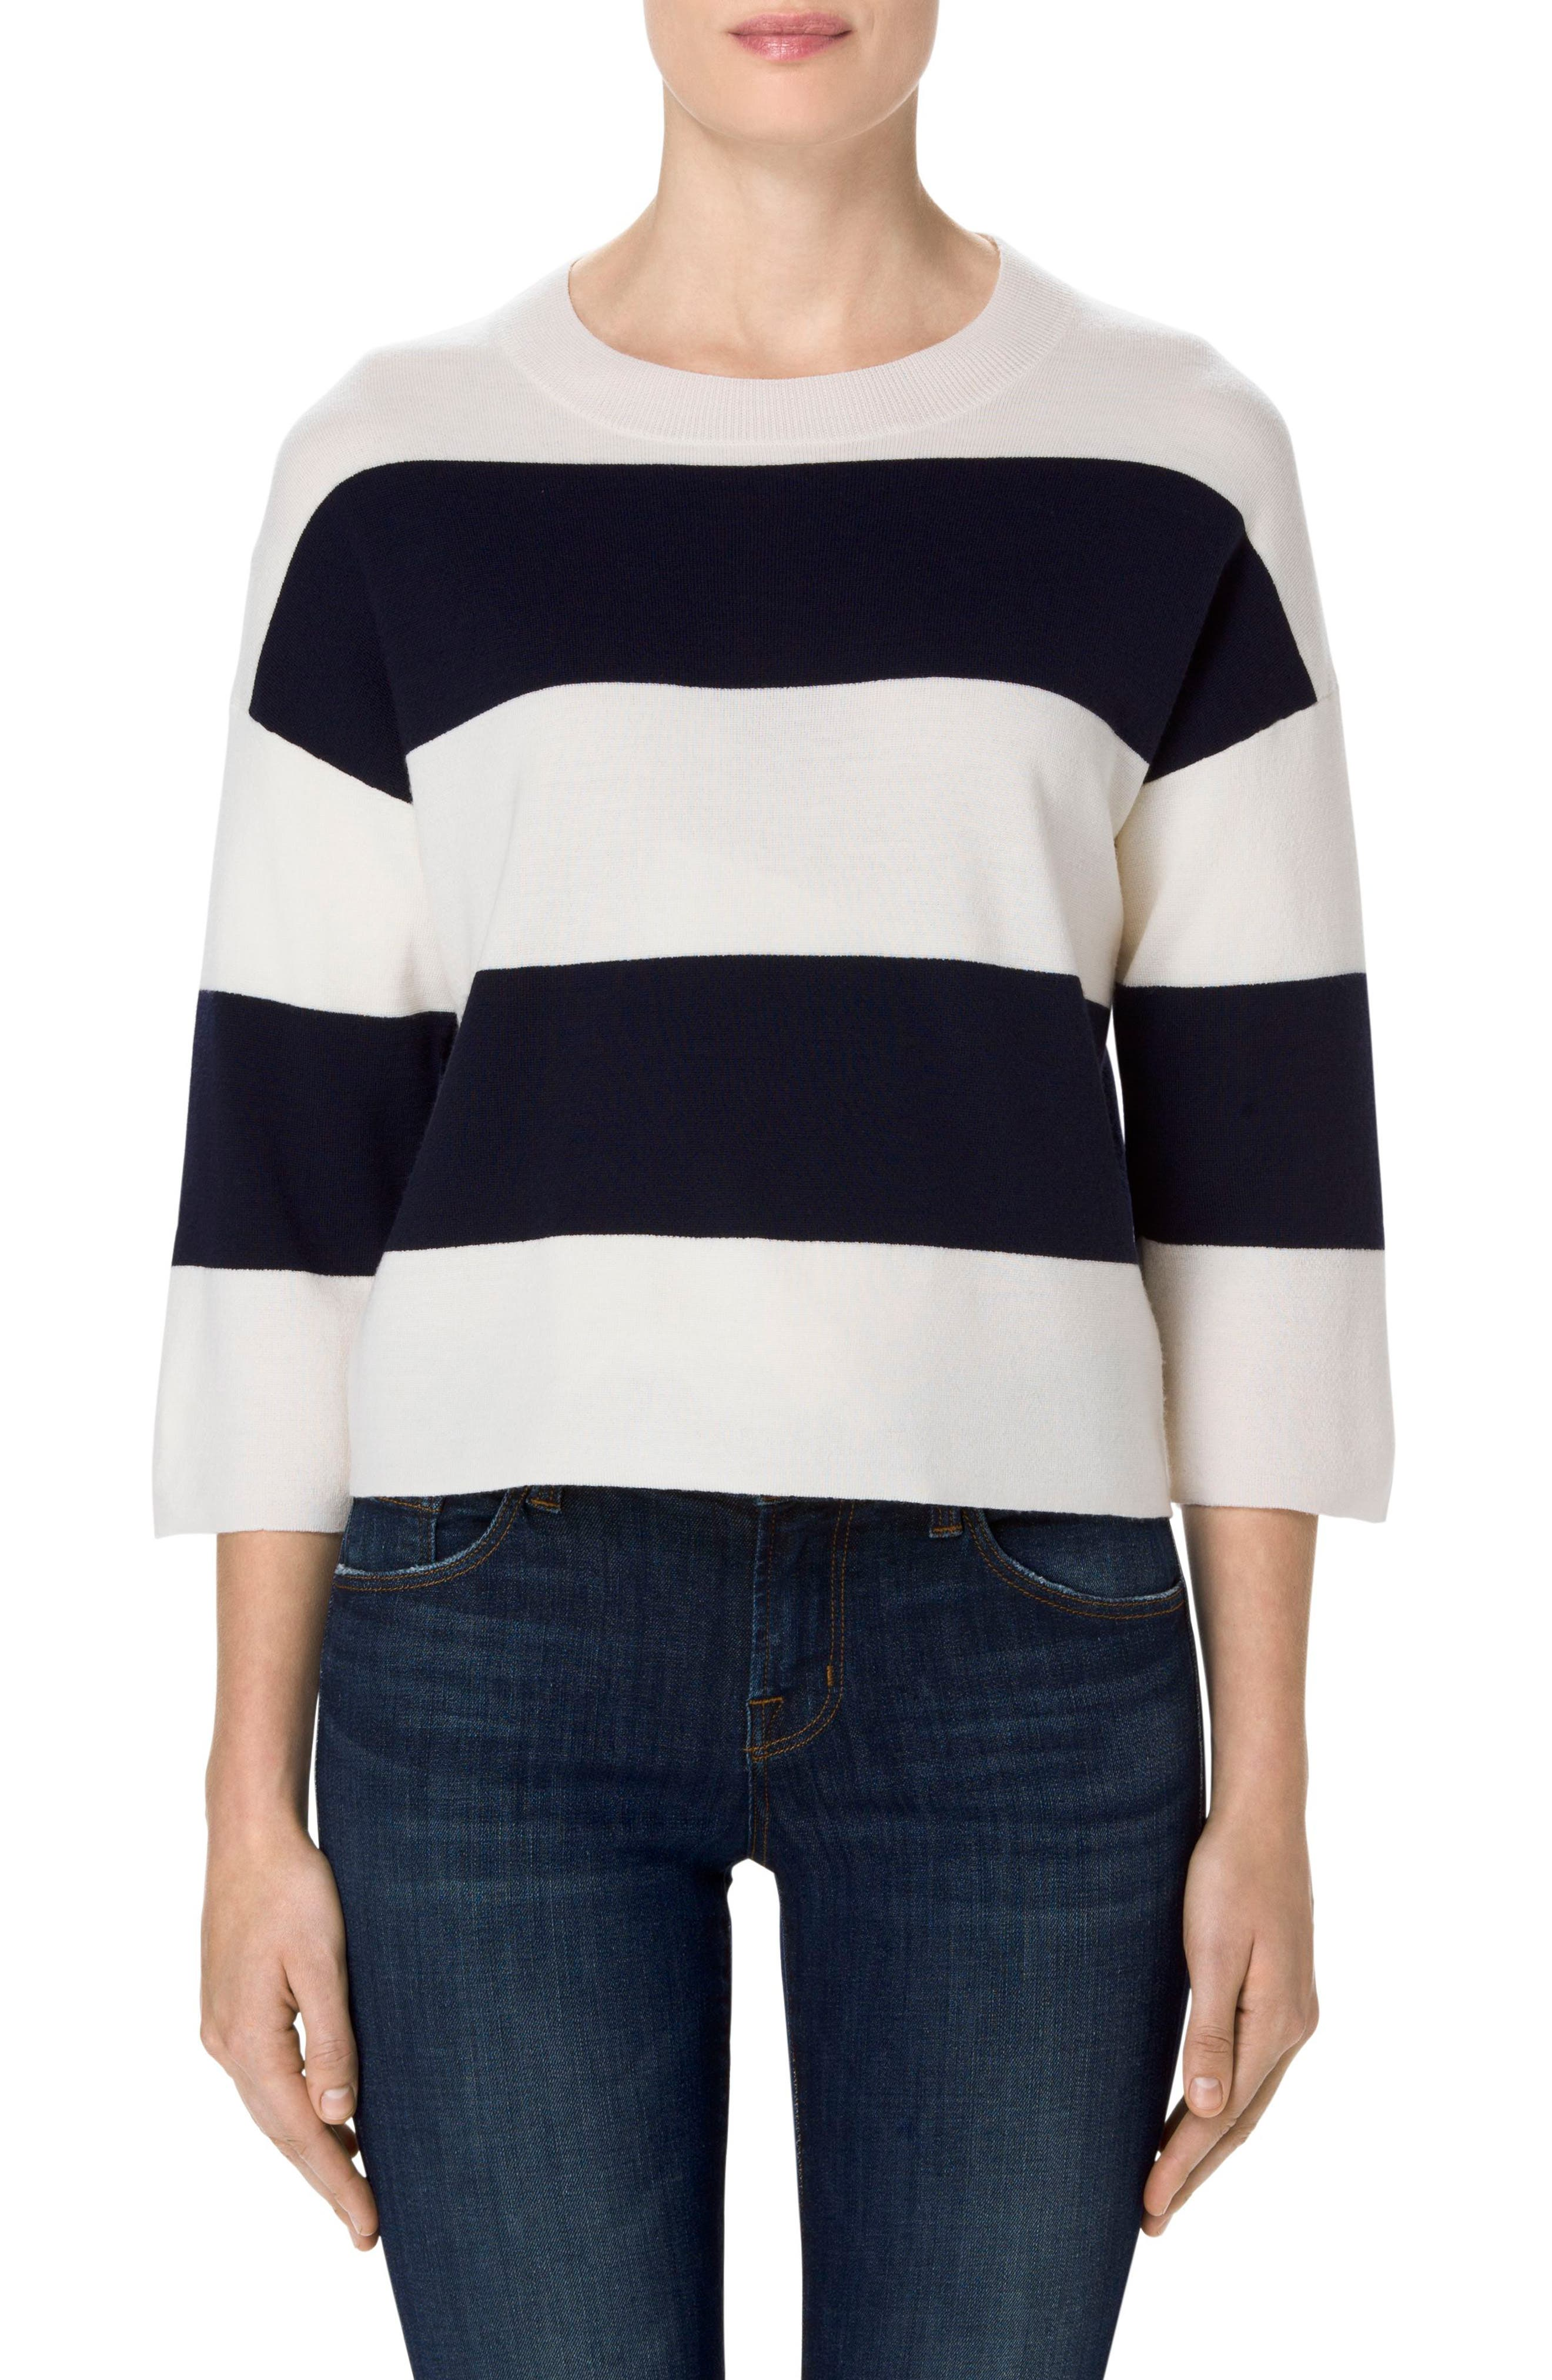 J BRAND Estero Merino Wool Sweater